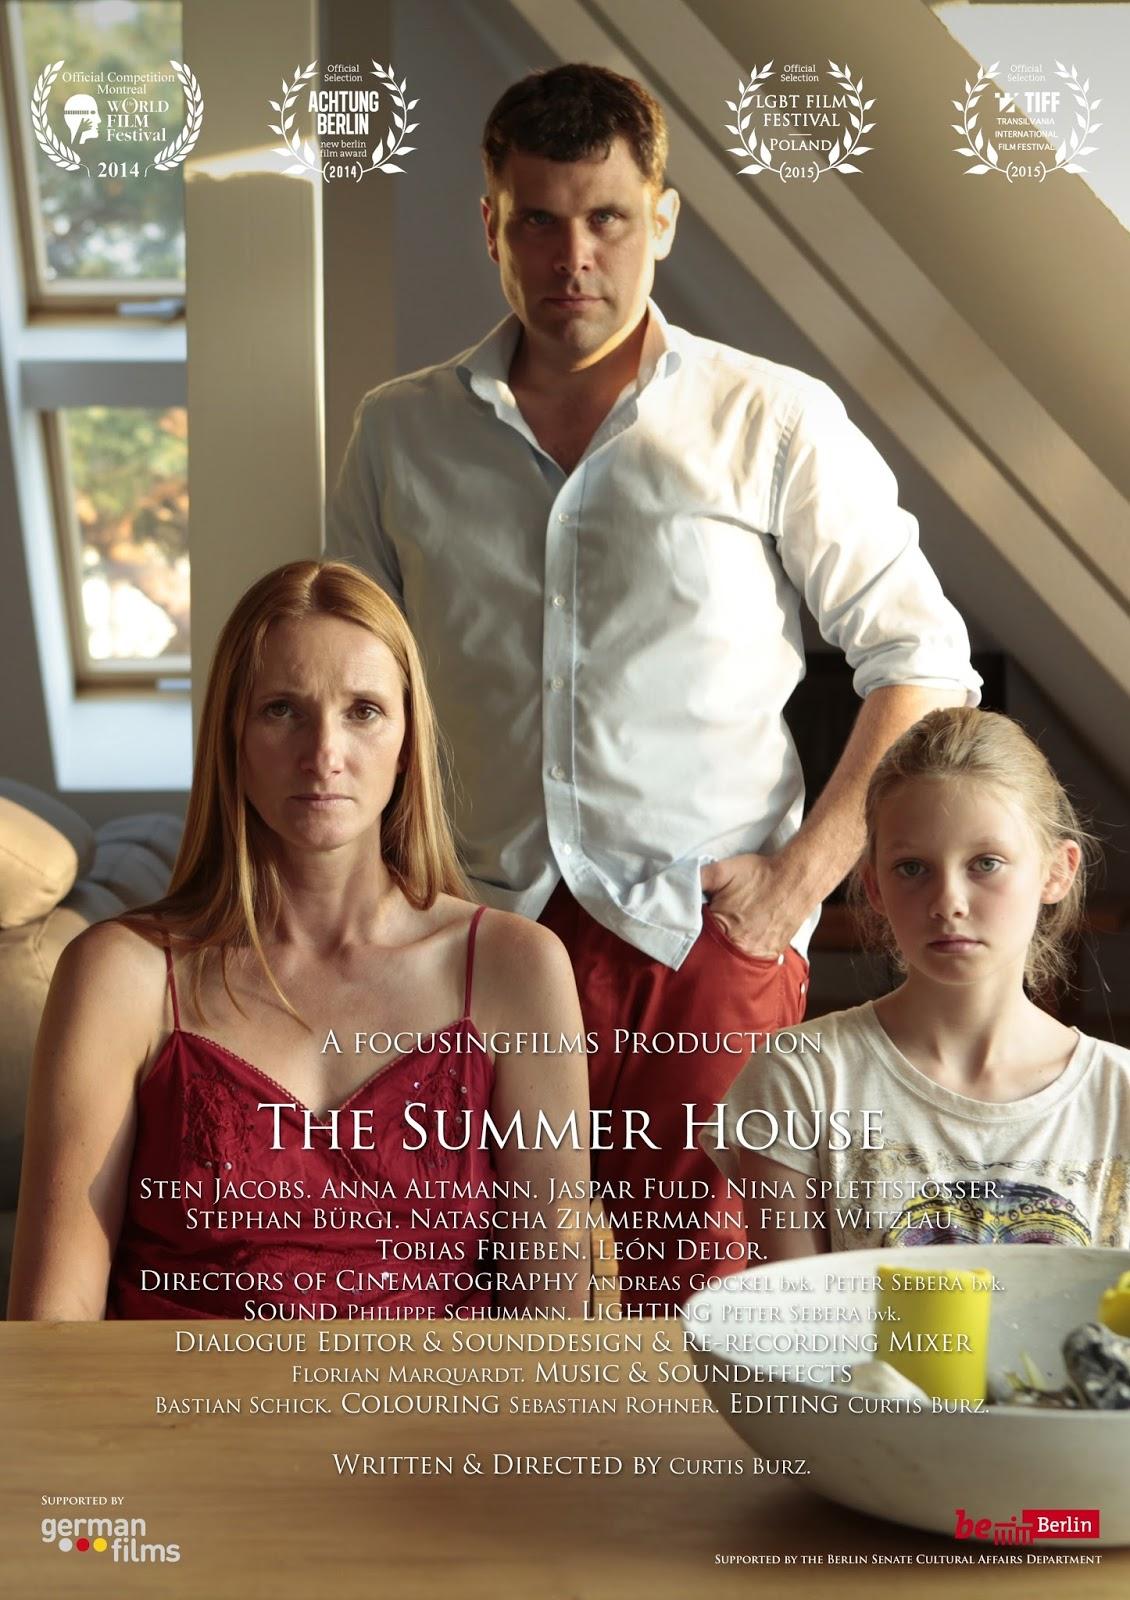 Movie Reviews - Gay Themed: Das Sommerhaus (German) [The